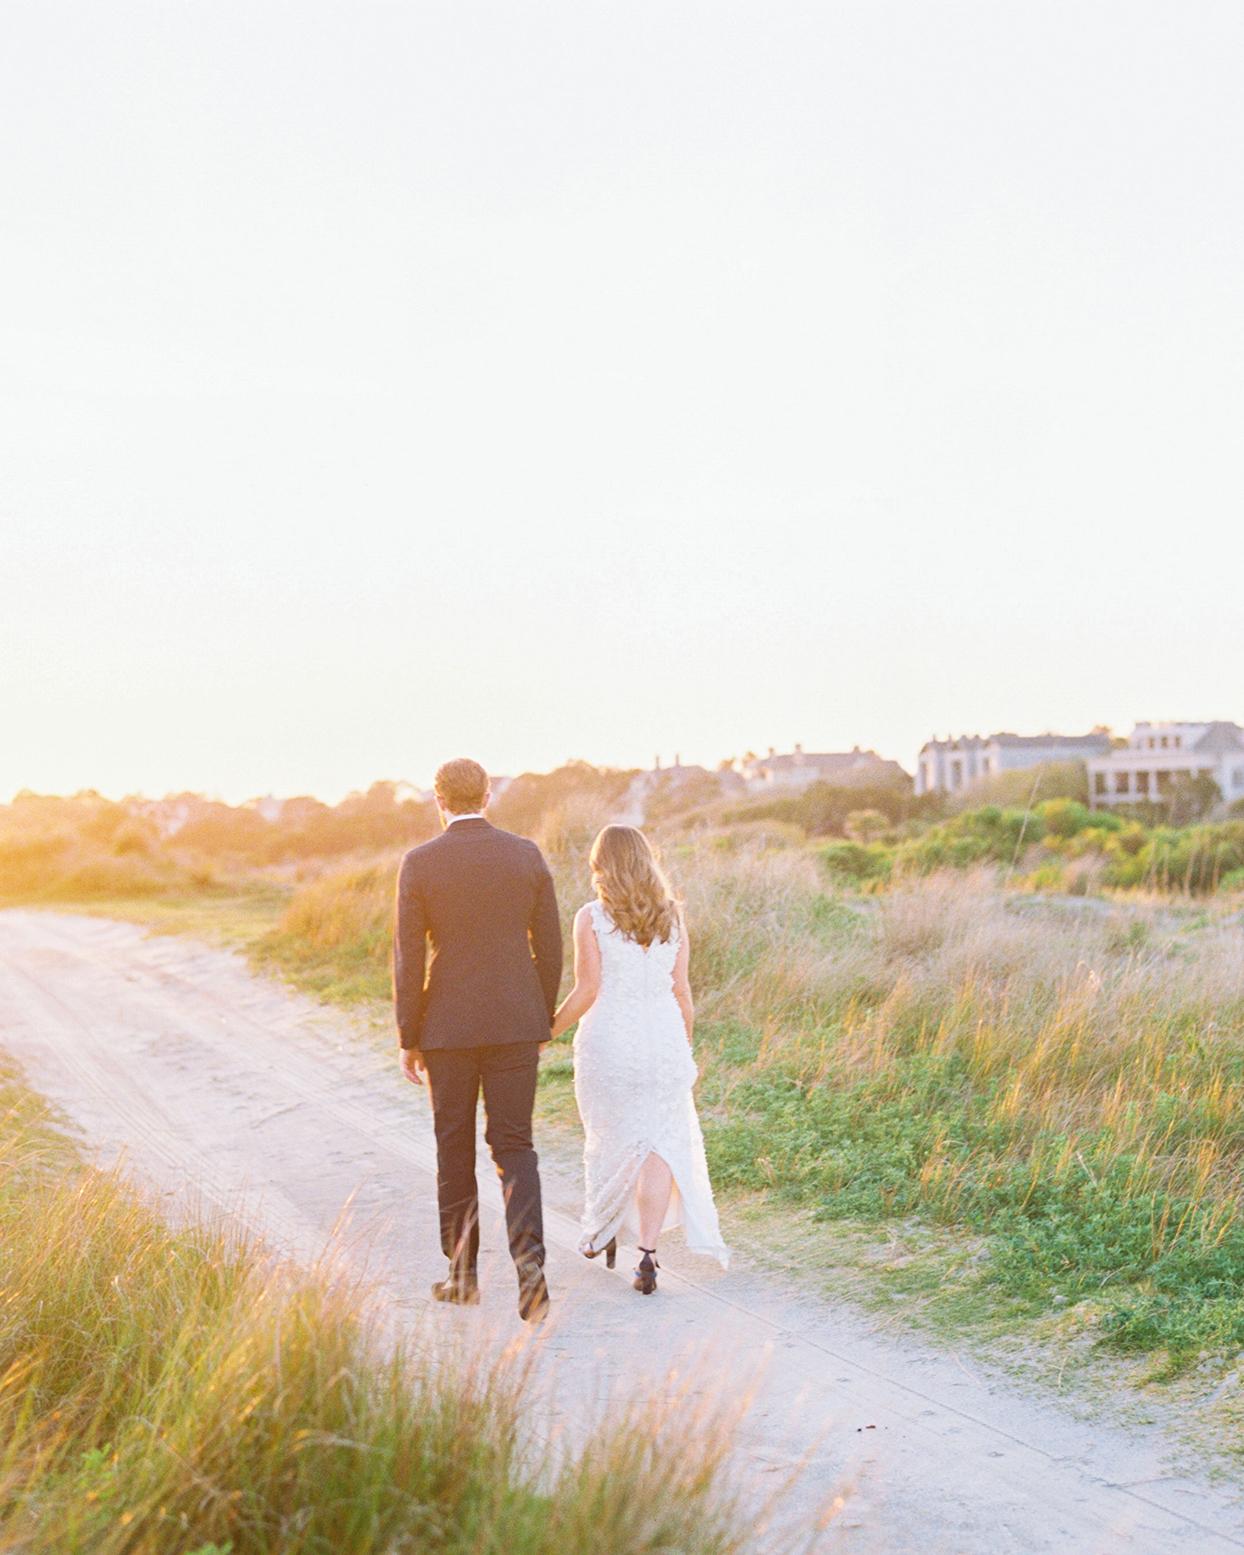 lauren dan wedding couple walking along sandy path